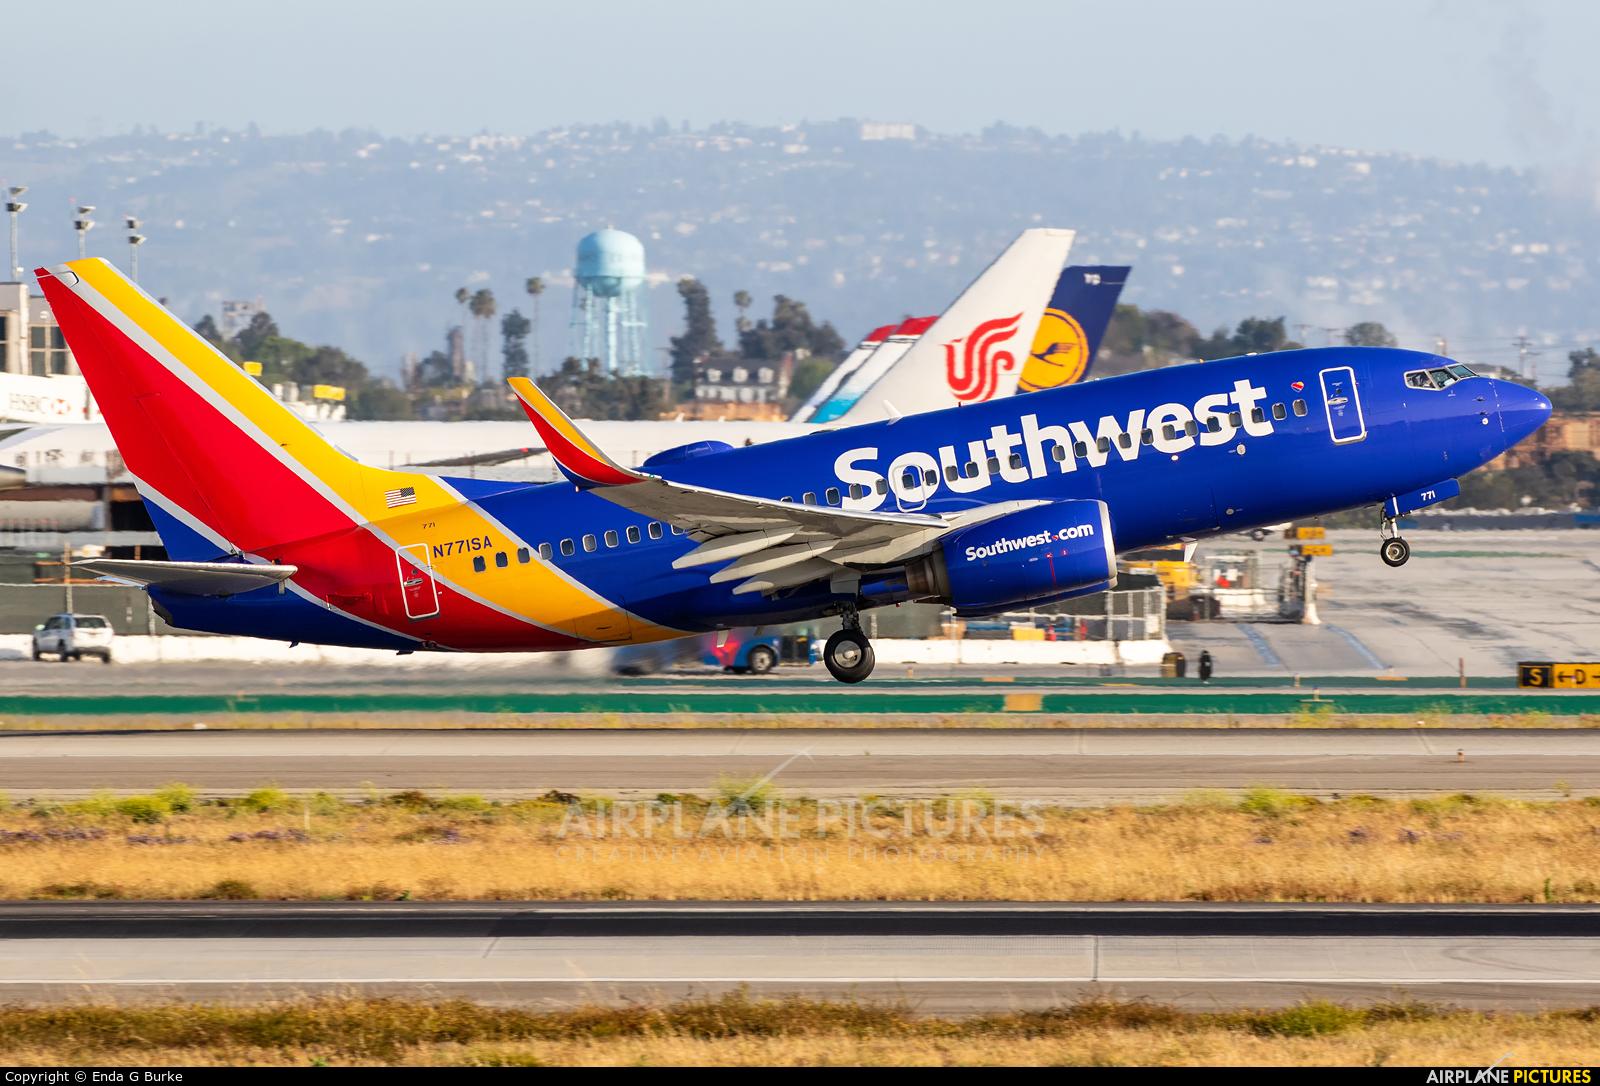 Southwest Airlines N771SA aircraft at Los Angeles Intl